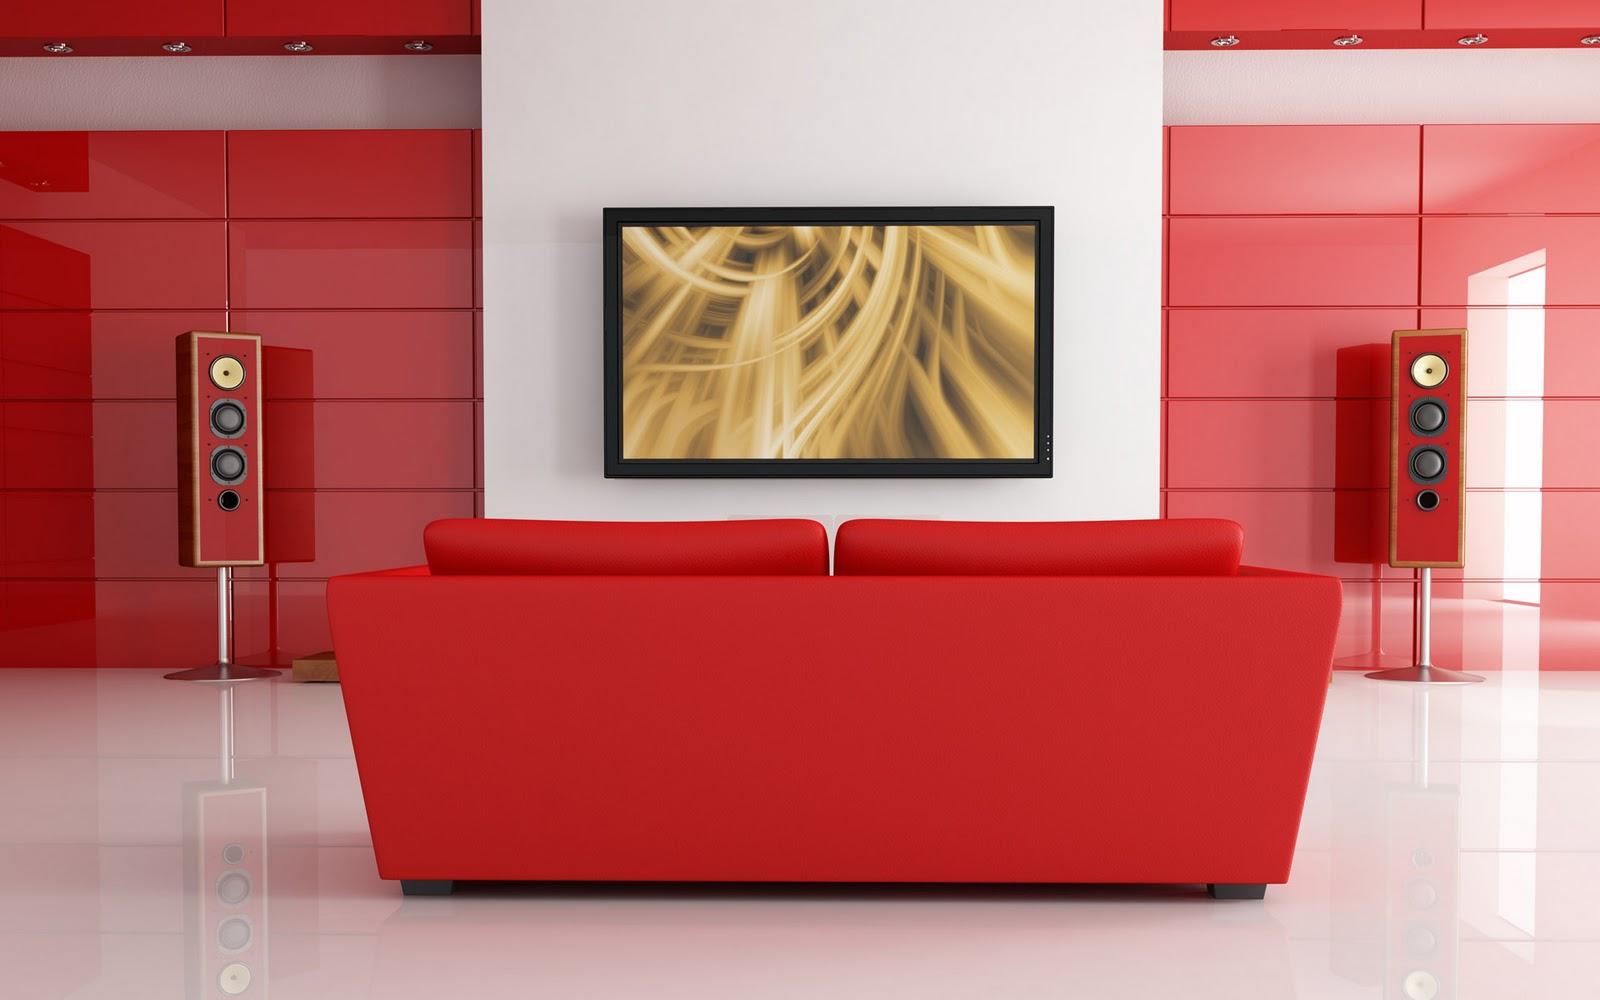 http://4.bp.blogspot.com/-lzxHrQsXgGg/UBfEsb-duXI/AAAAAAAADtY/ZSenWBK1Pyo/s1600/Living-Room-wallpaper-1.jpg